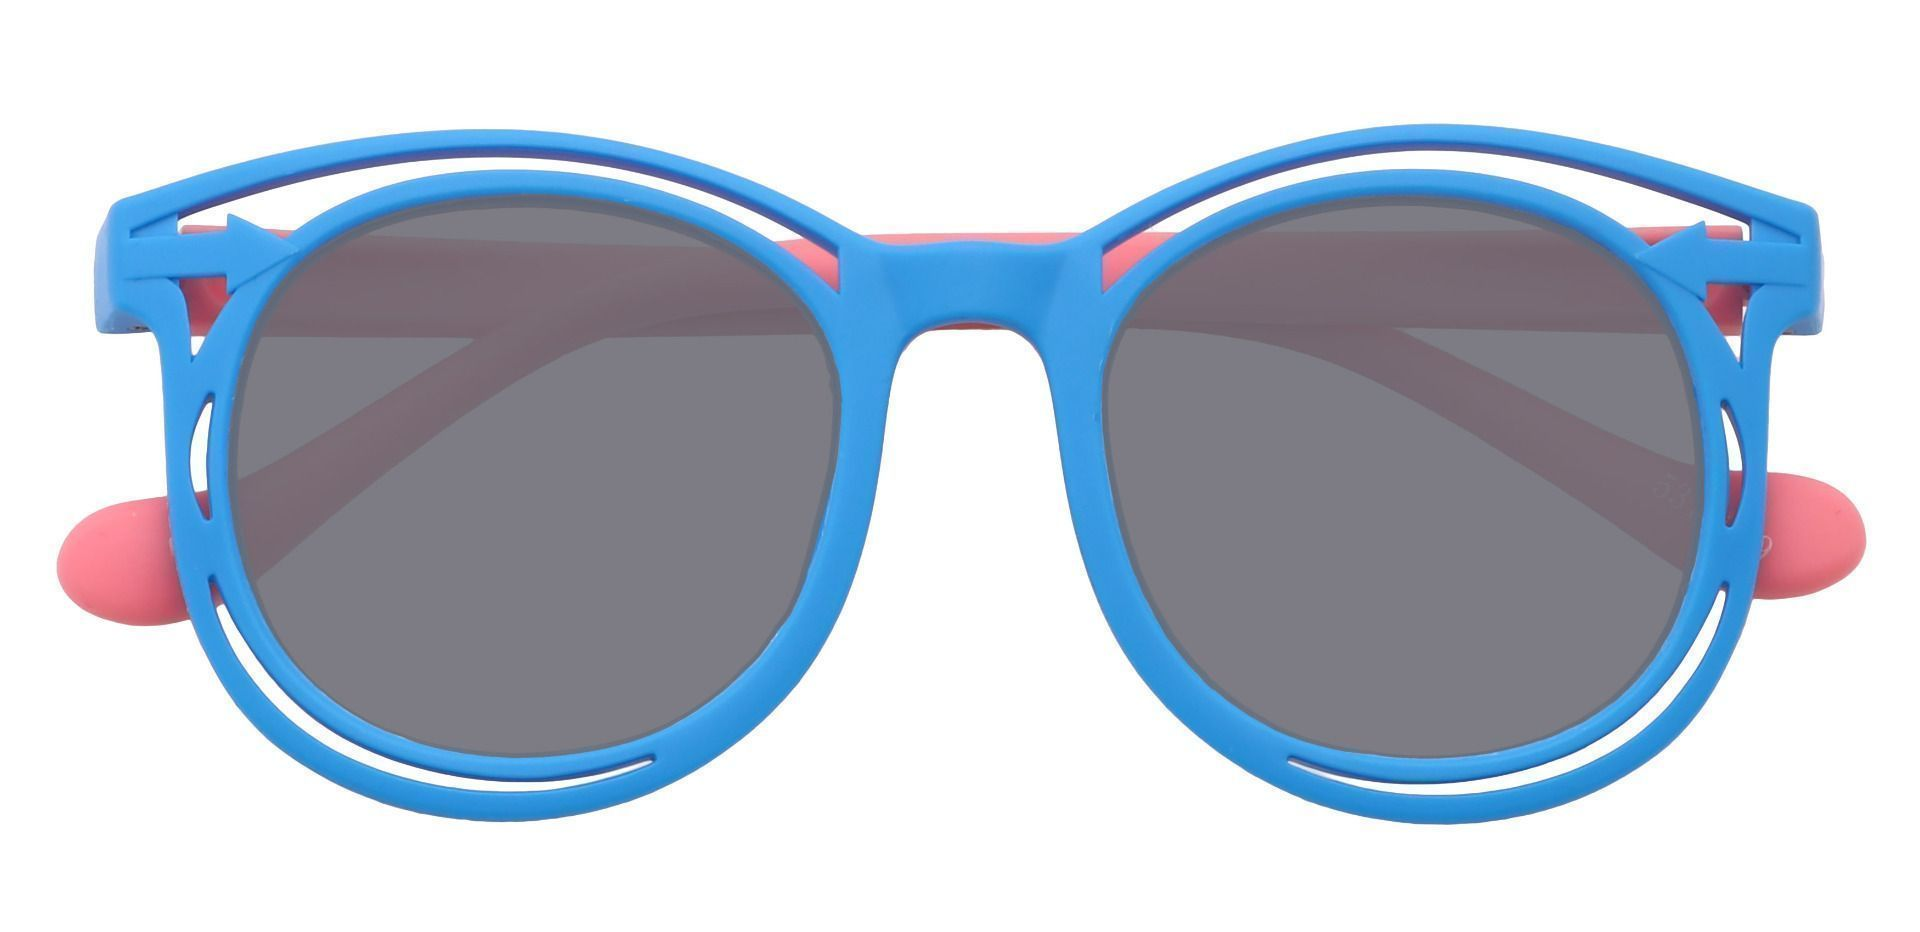 Bolt Round Single Vision Sunglasses - Blue Frame With Gray Lenses